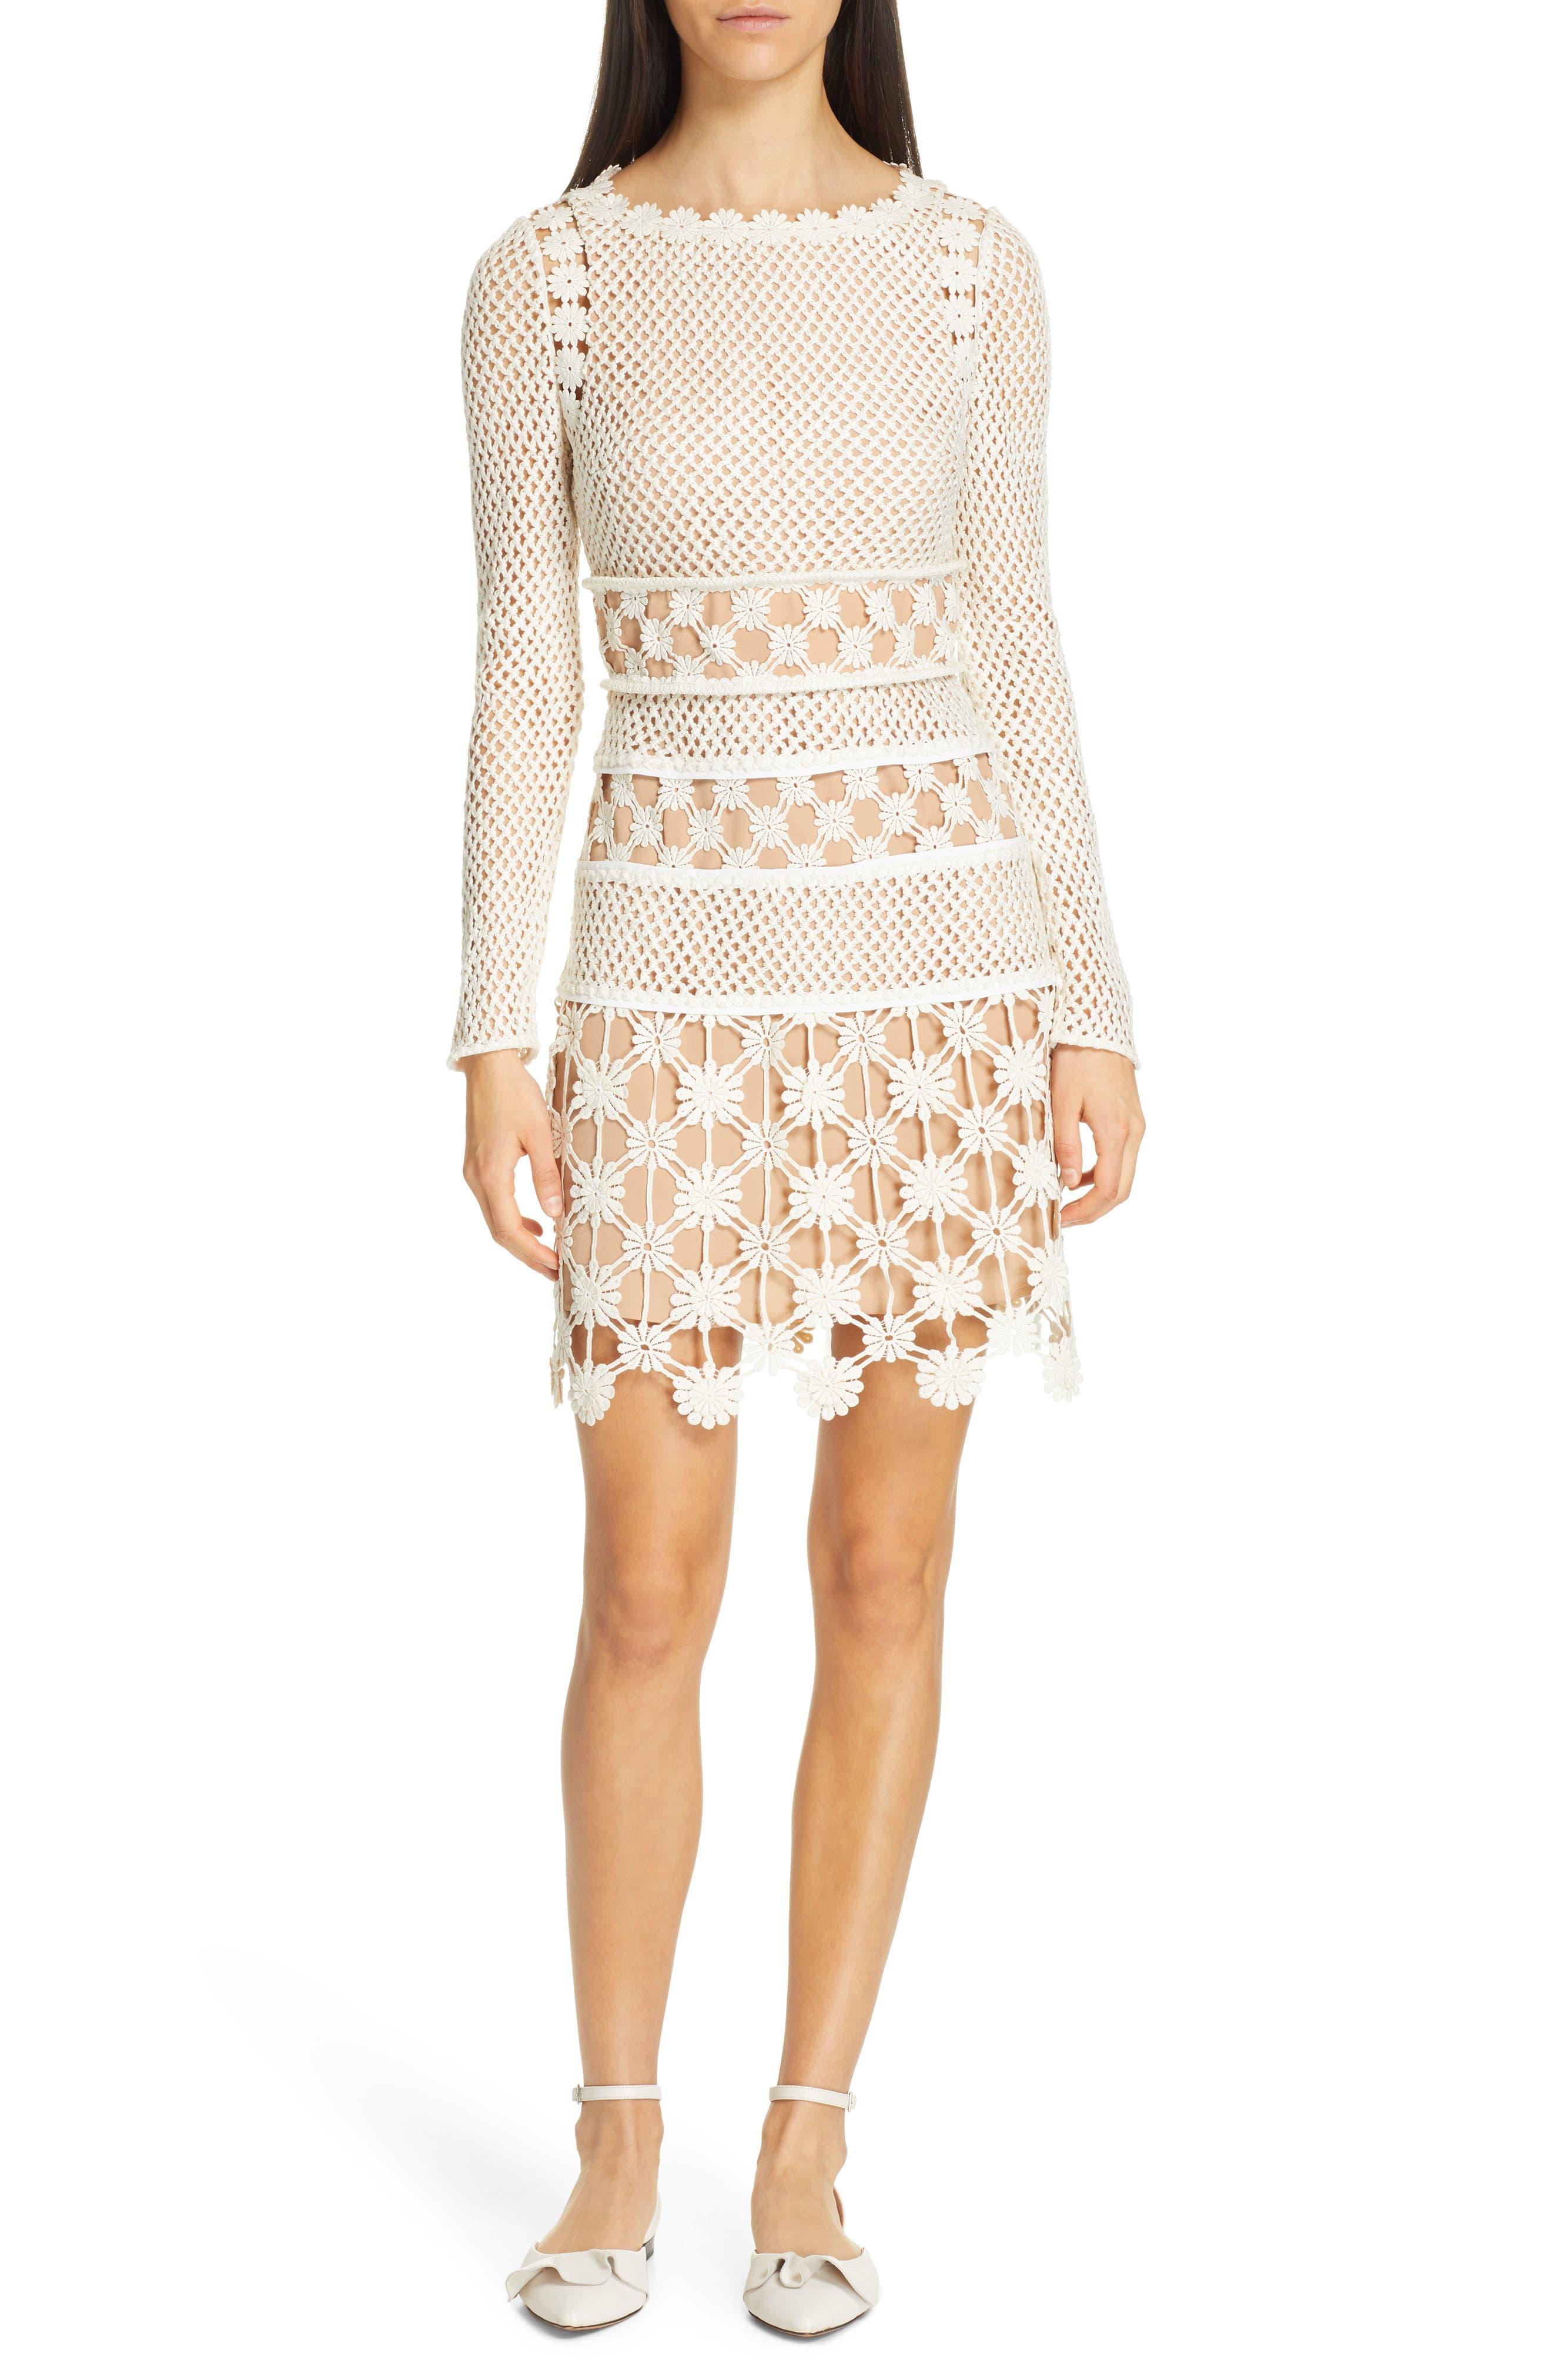 Self-Portrait Long Sleeve 3D Floral Crochet Lace Minidress, Ivory